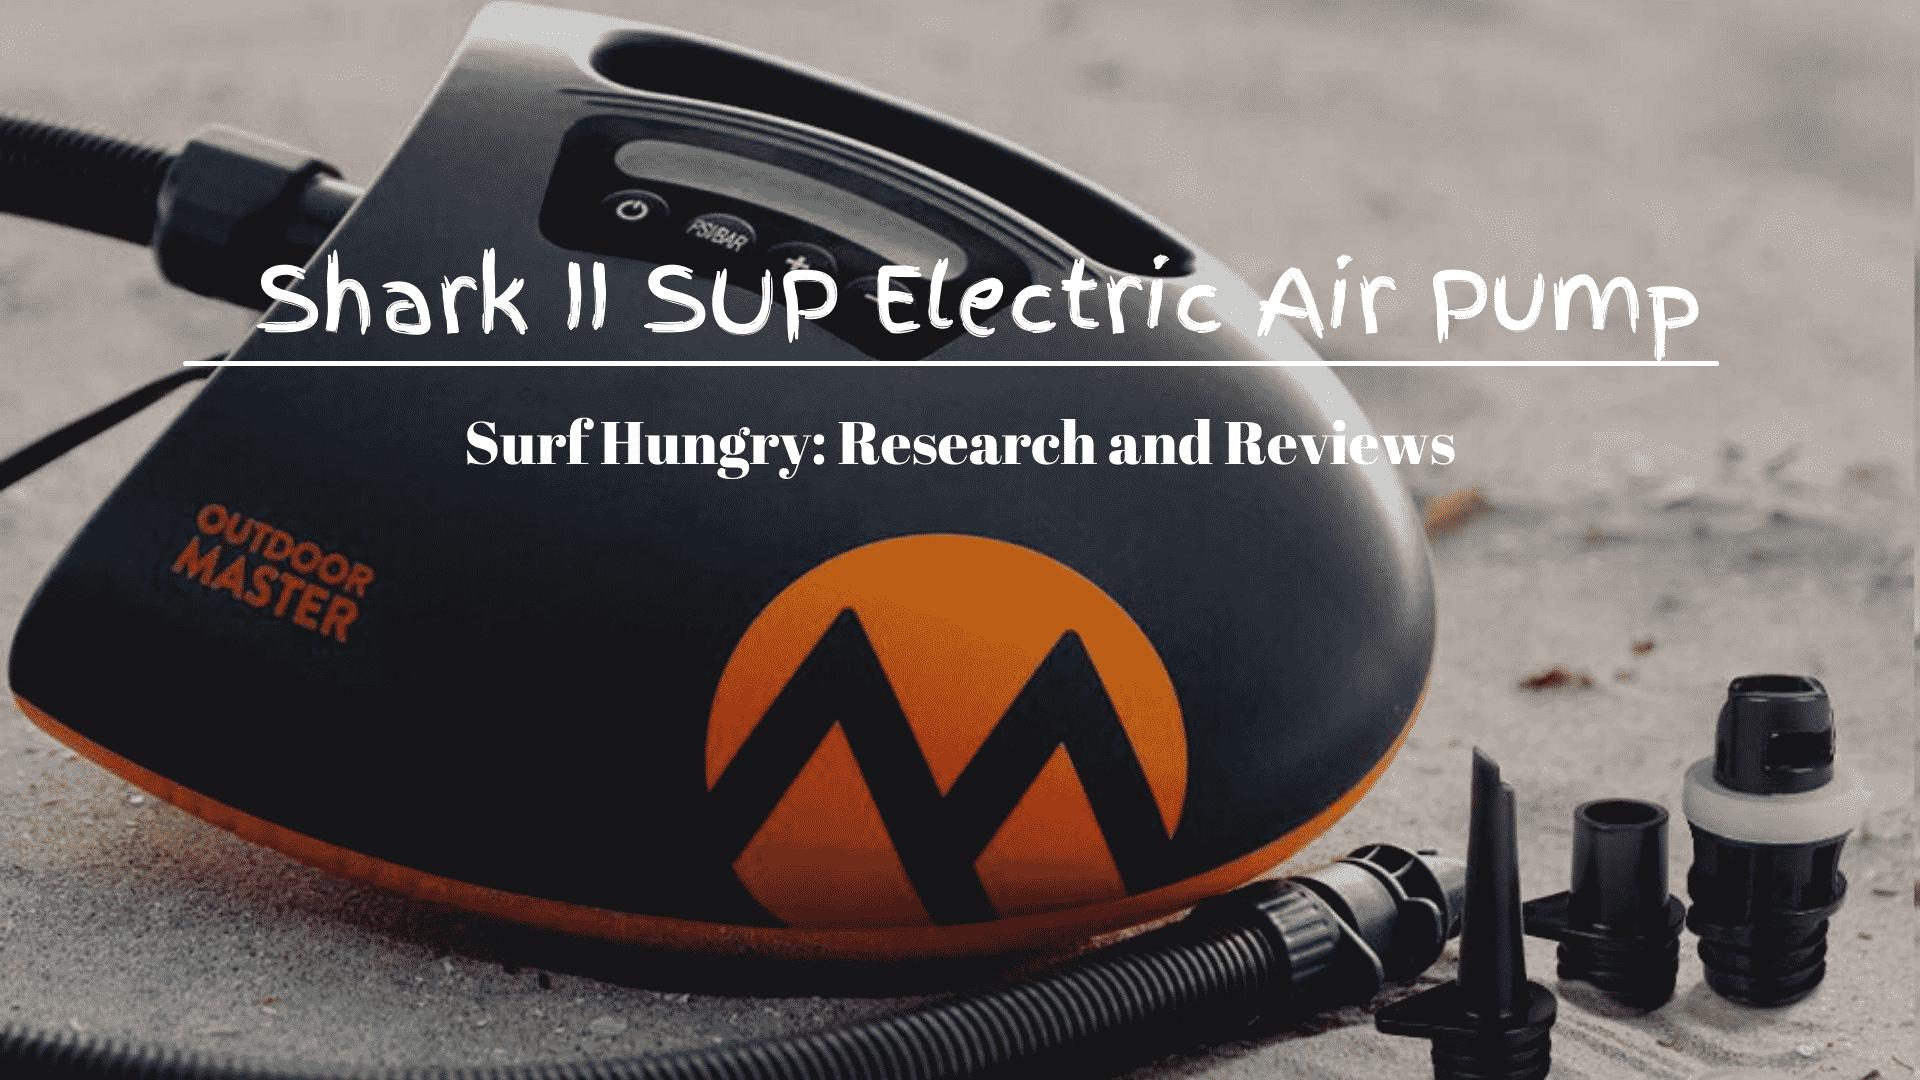 Shark II SUP Electric Air Pump review